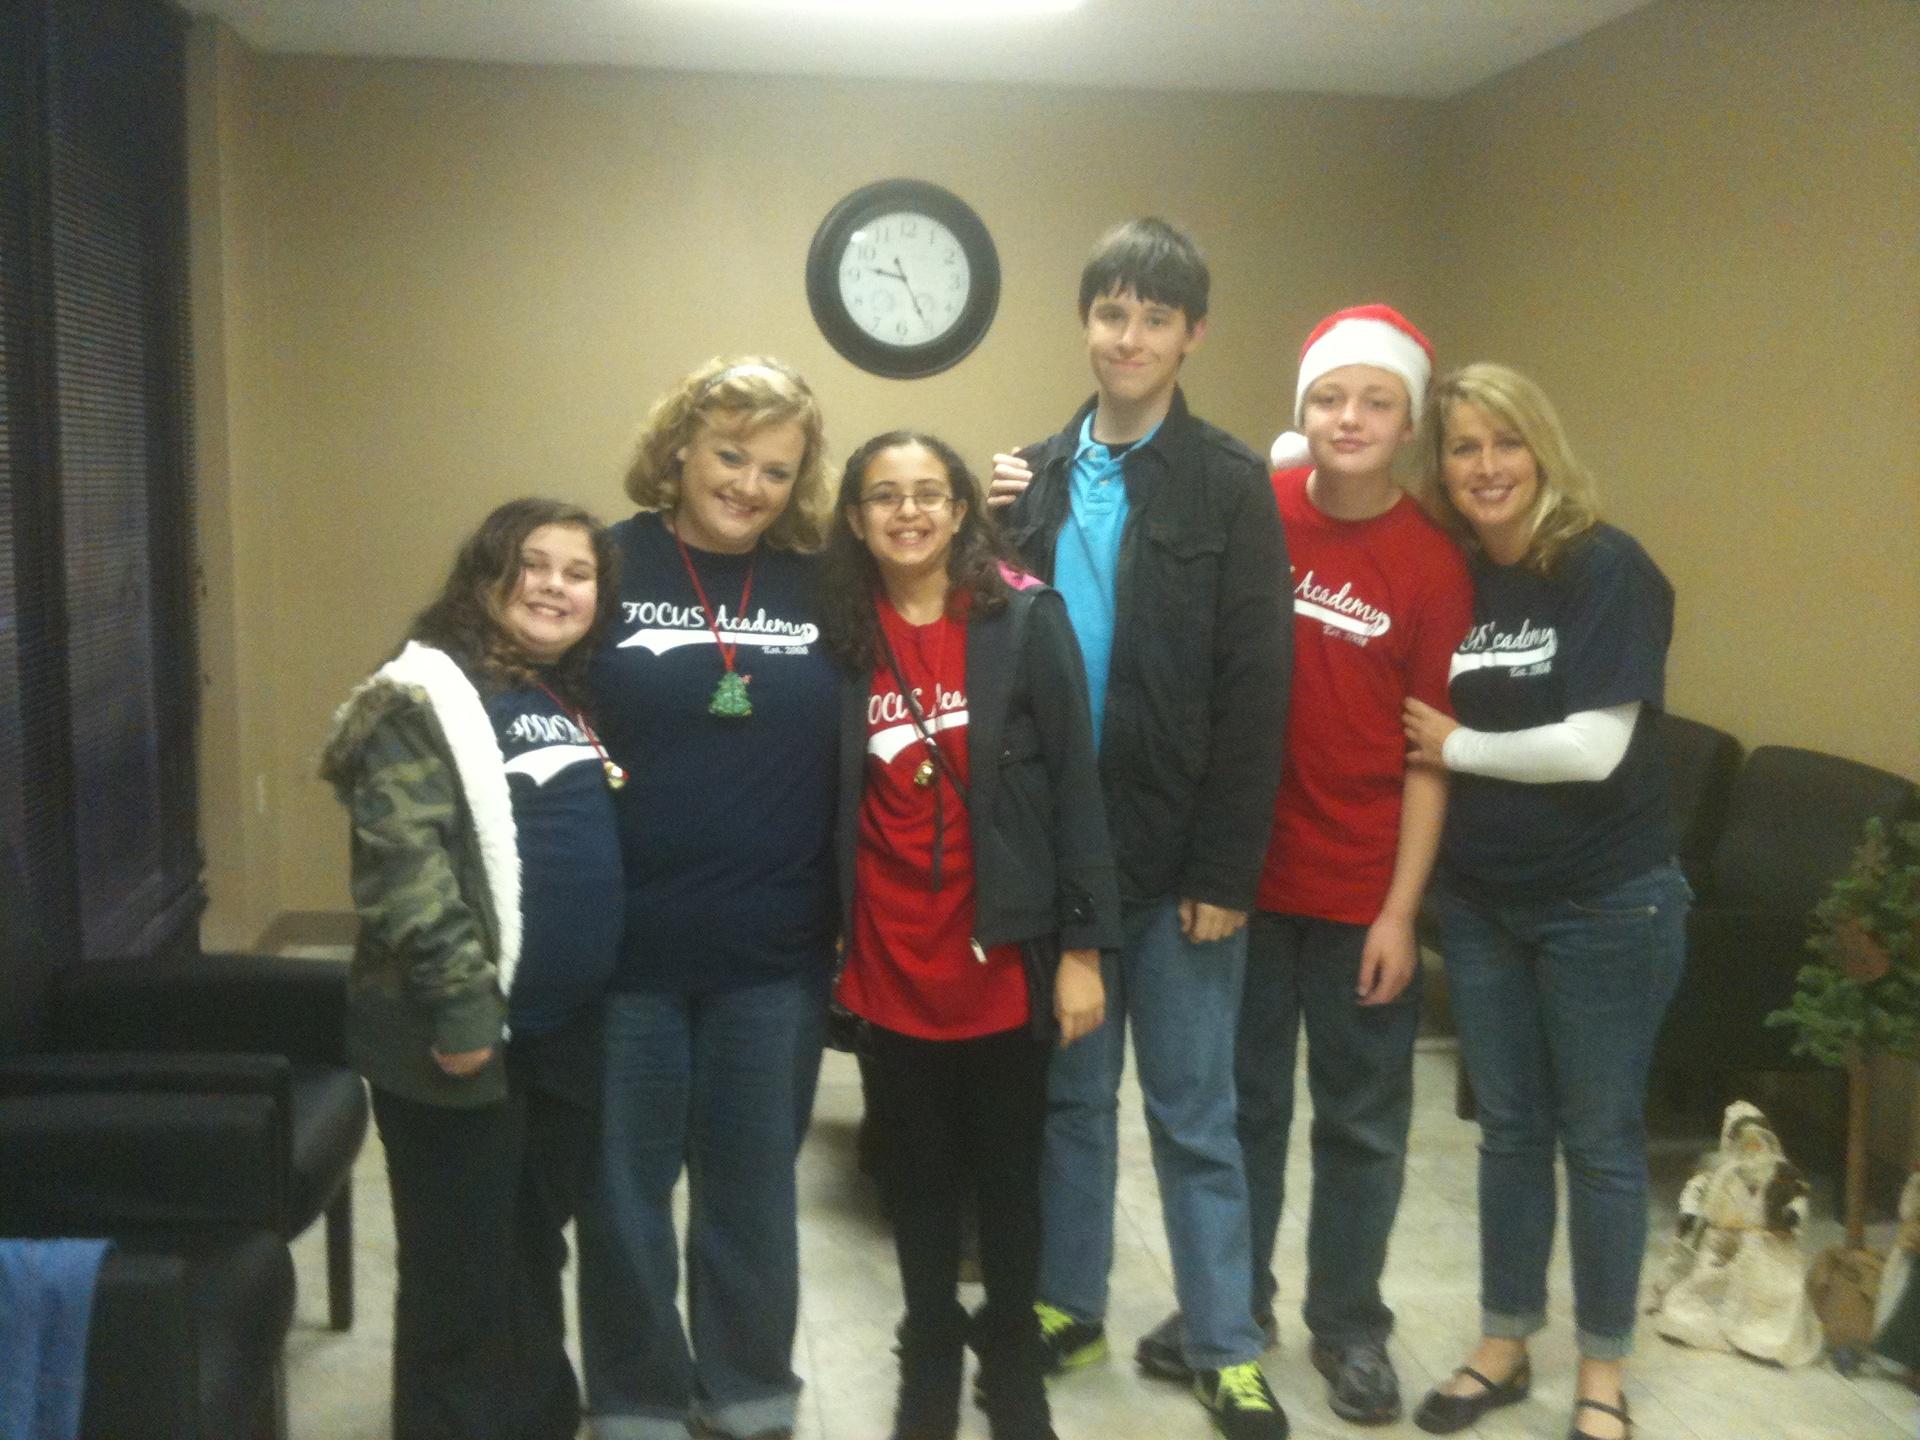 The 2011-12 Woodlands Crew